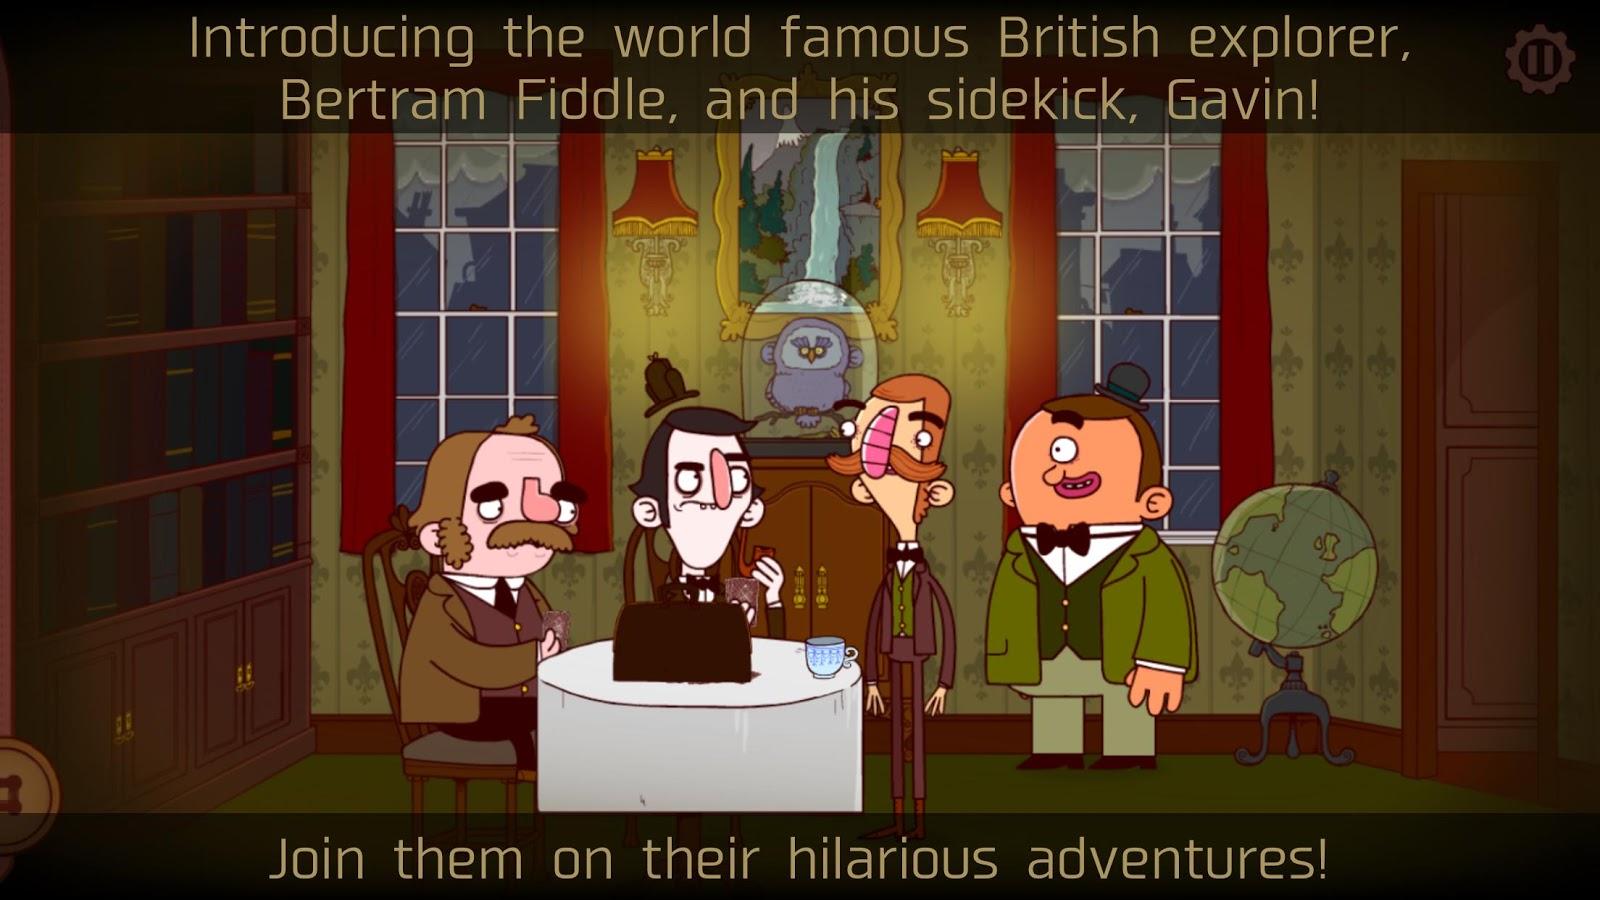 Bertram Fiddle: Episode 1 FREE (£0.89) on Google Playstore